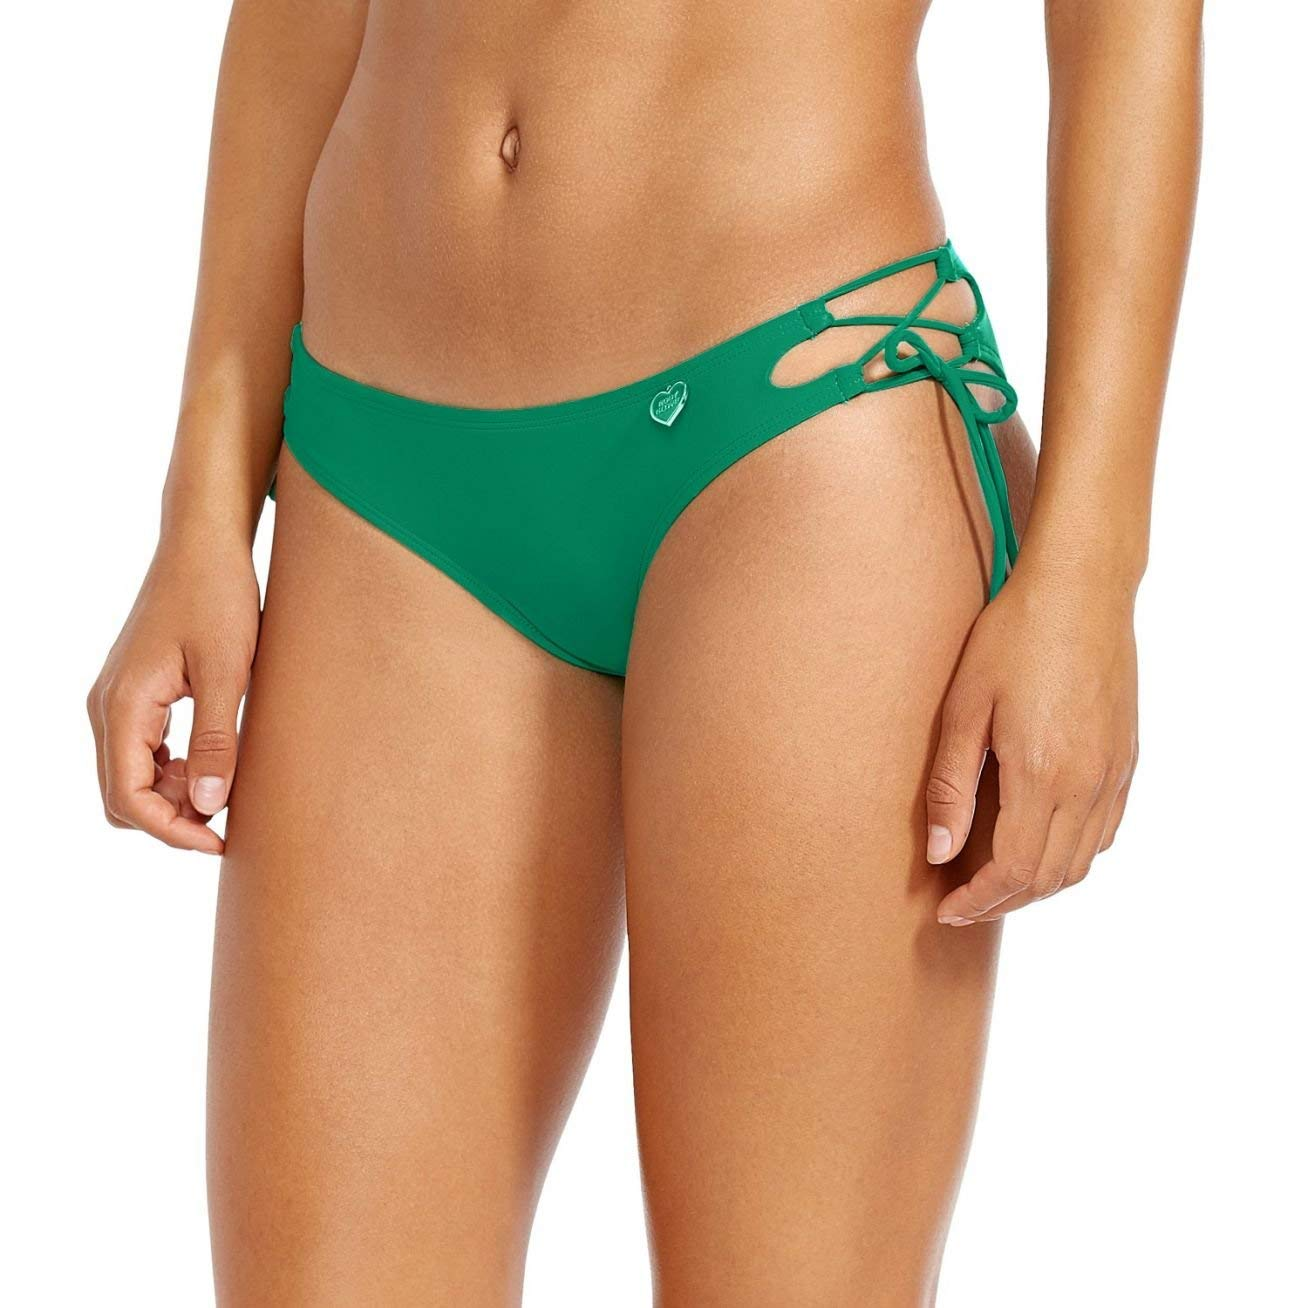 91758fd1cd Amazon.com  Body Glove Women s Smoothies Tie Side Mia Mid Coverage Bikini  Bottom Swimsuit  Clothing